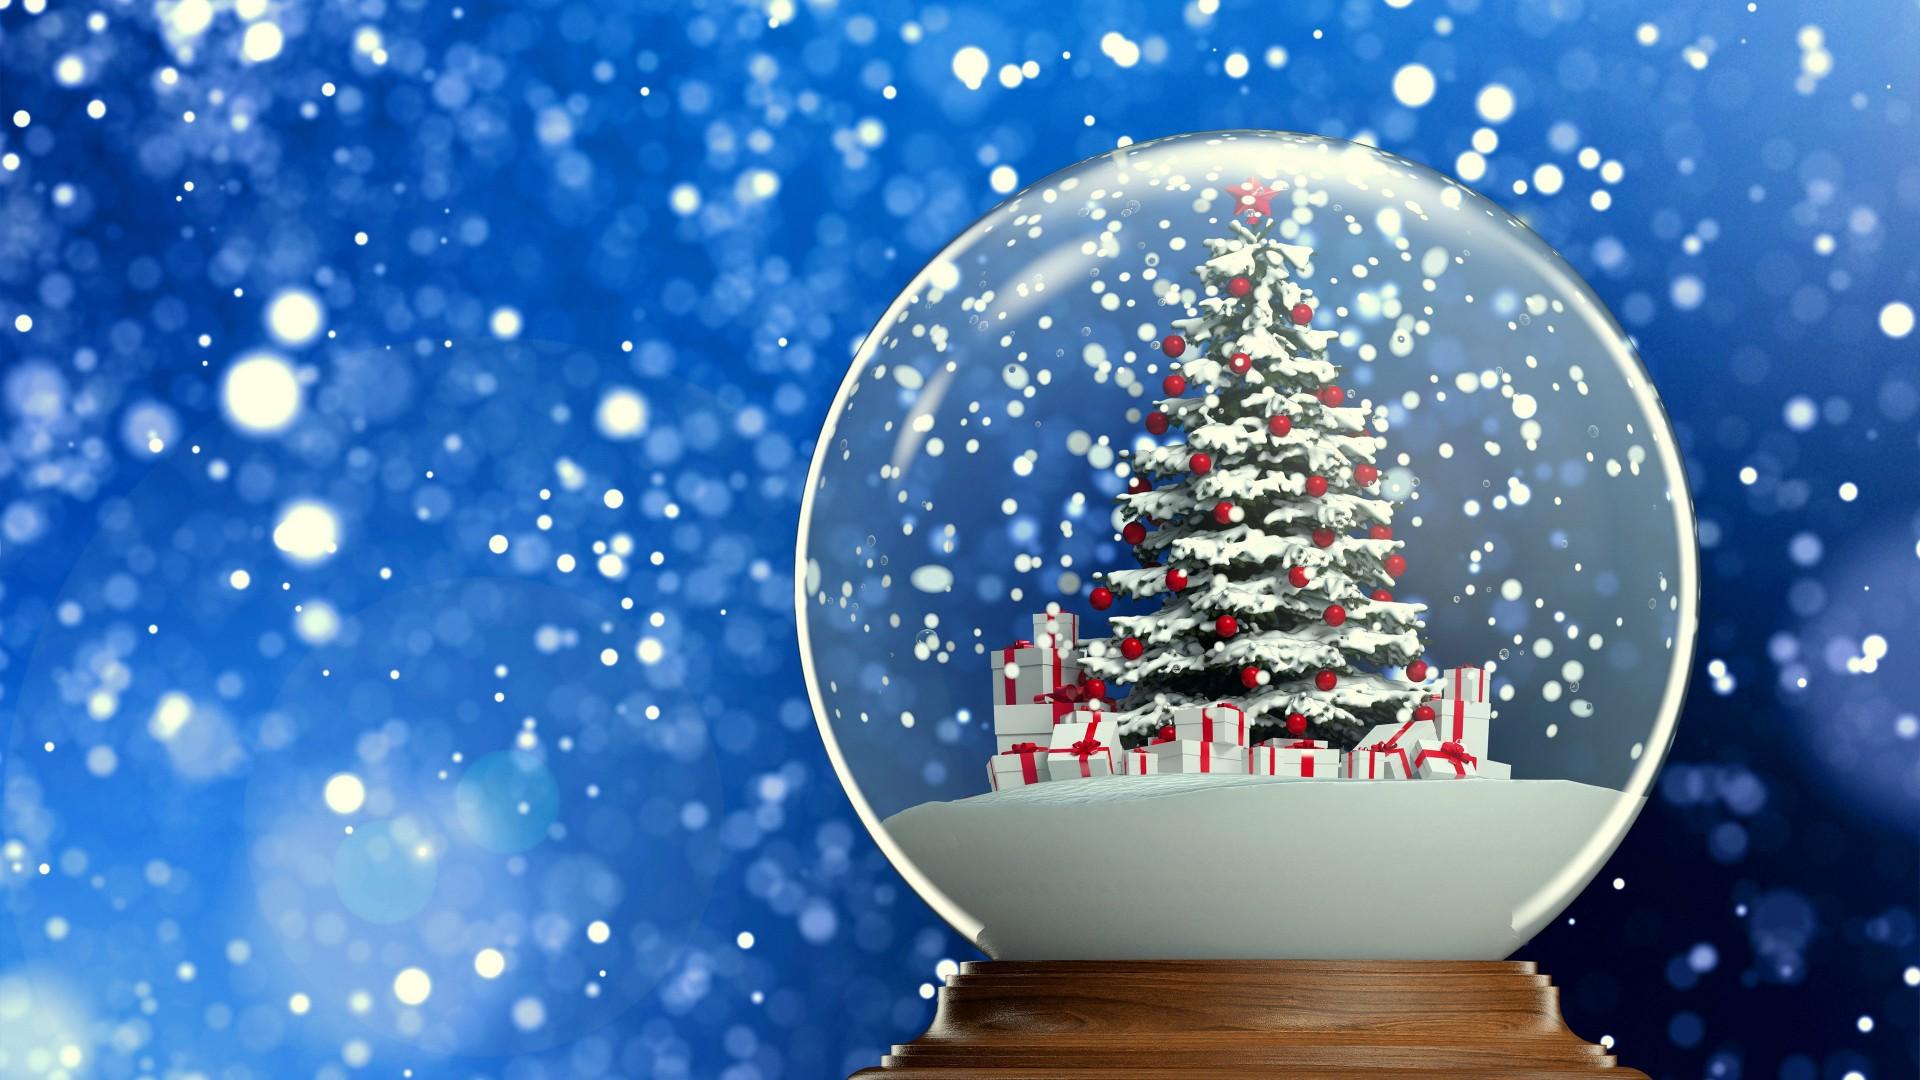 Free Download Winter Snow Globe Christmas Tree Hd Wallpaper